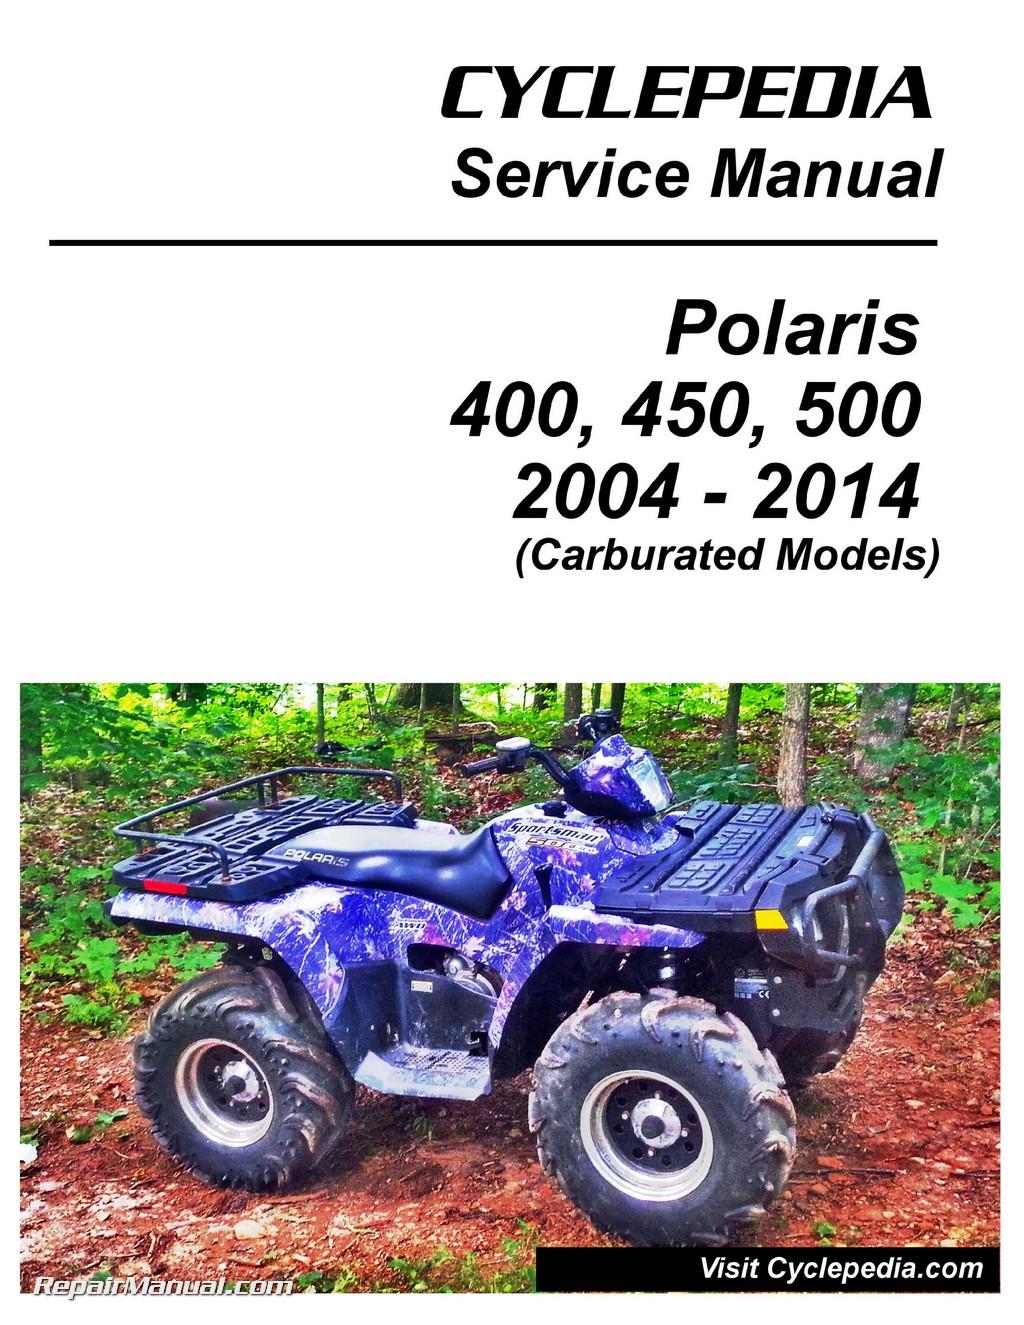 Polaris Sportsman 400 Wiring Diagram from static-cdn.imageservice.cloud